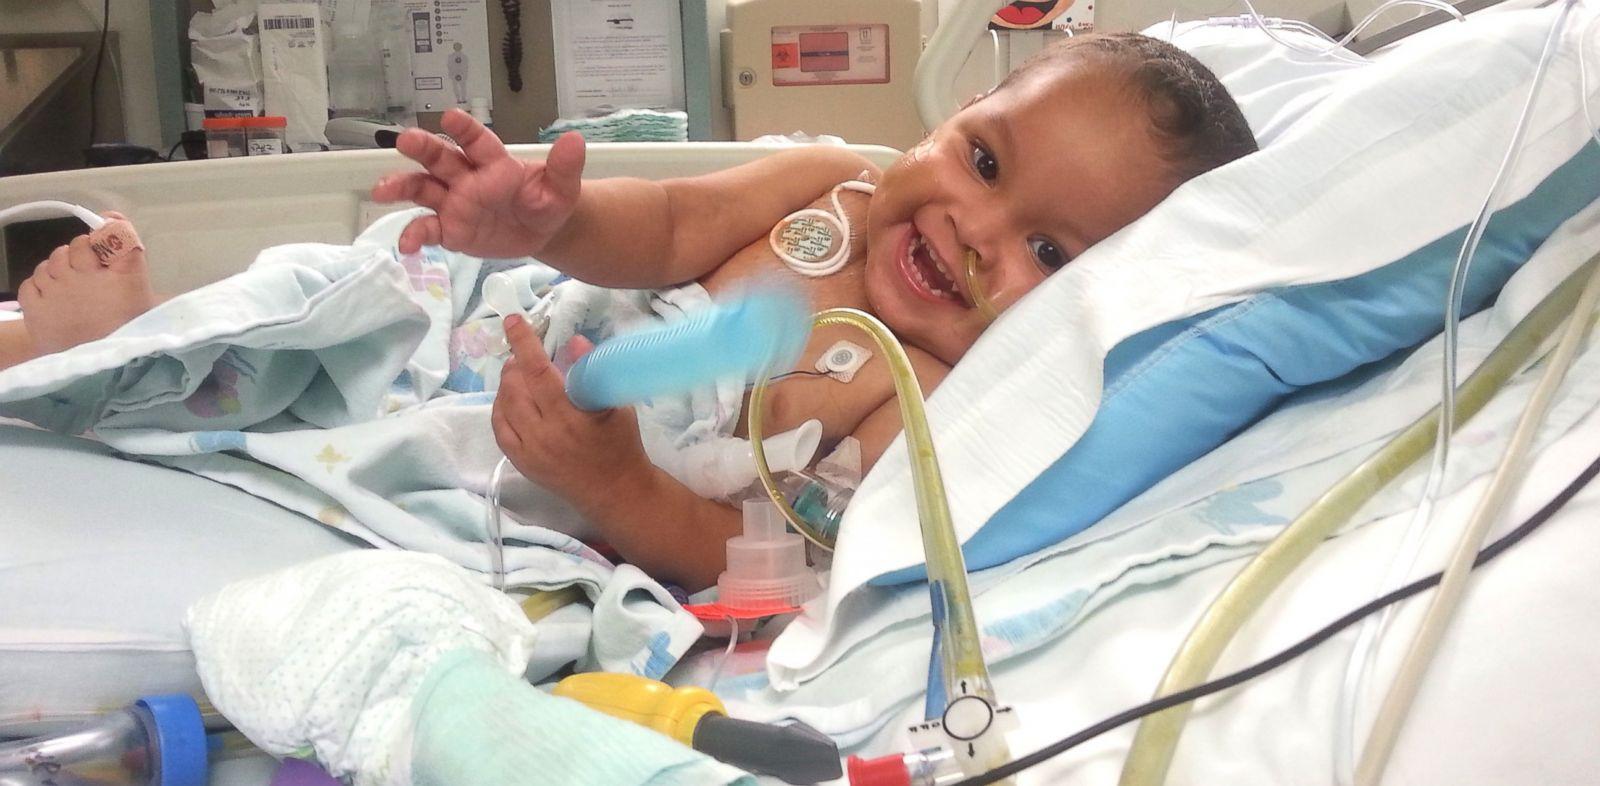 PHOTO: Adonis Ortiz smiles after multiple organ transplant surgery at Jackson Memorial Hospital in Miami.